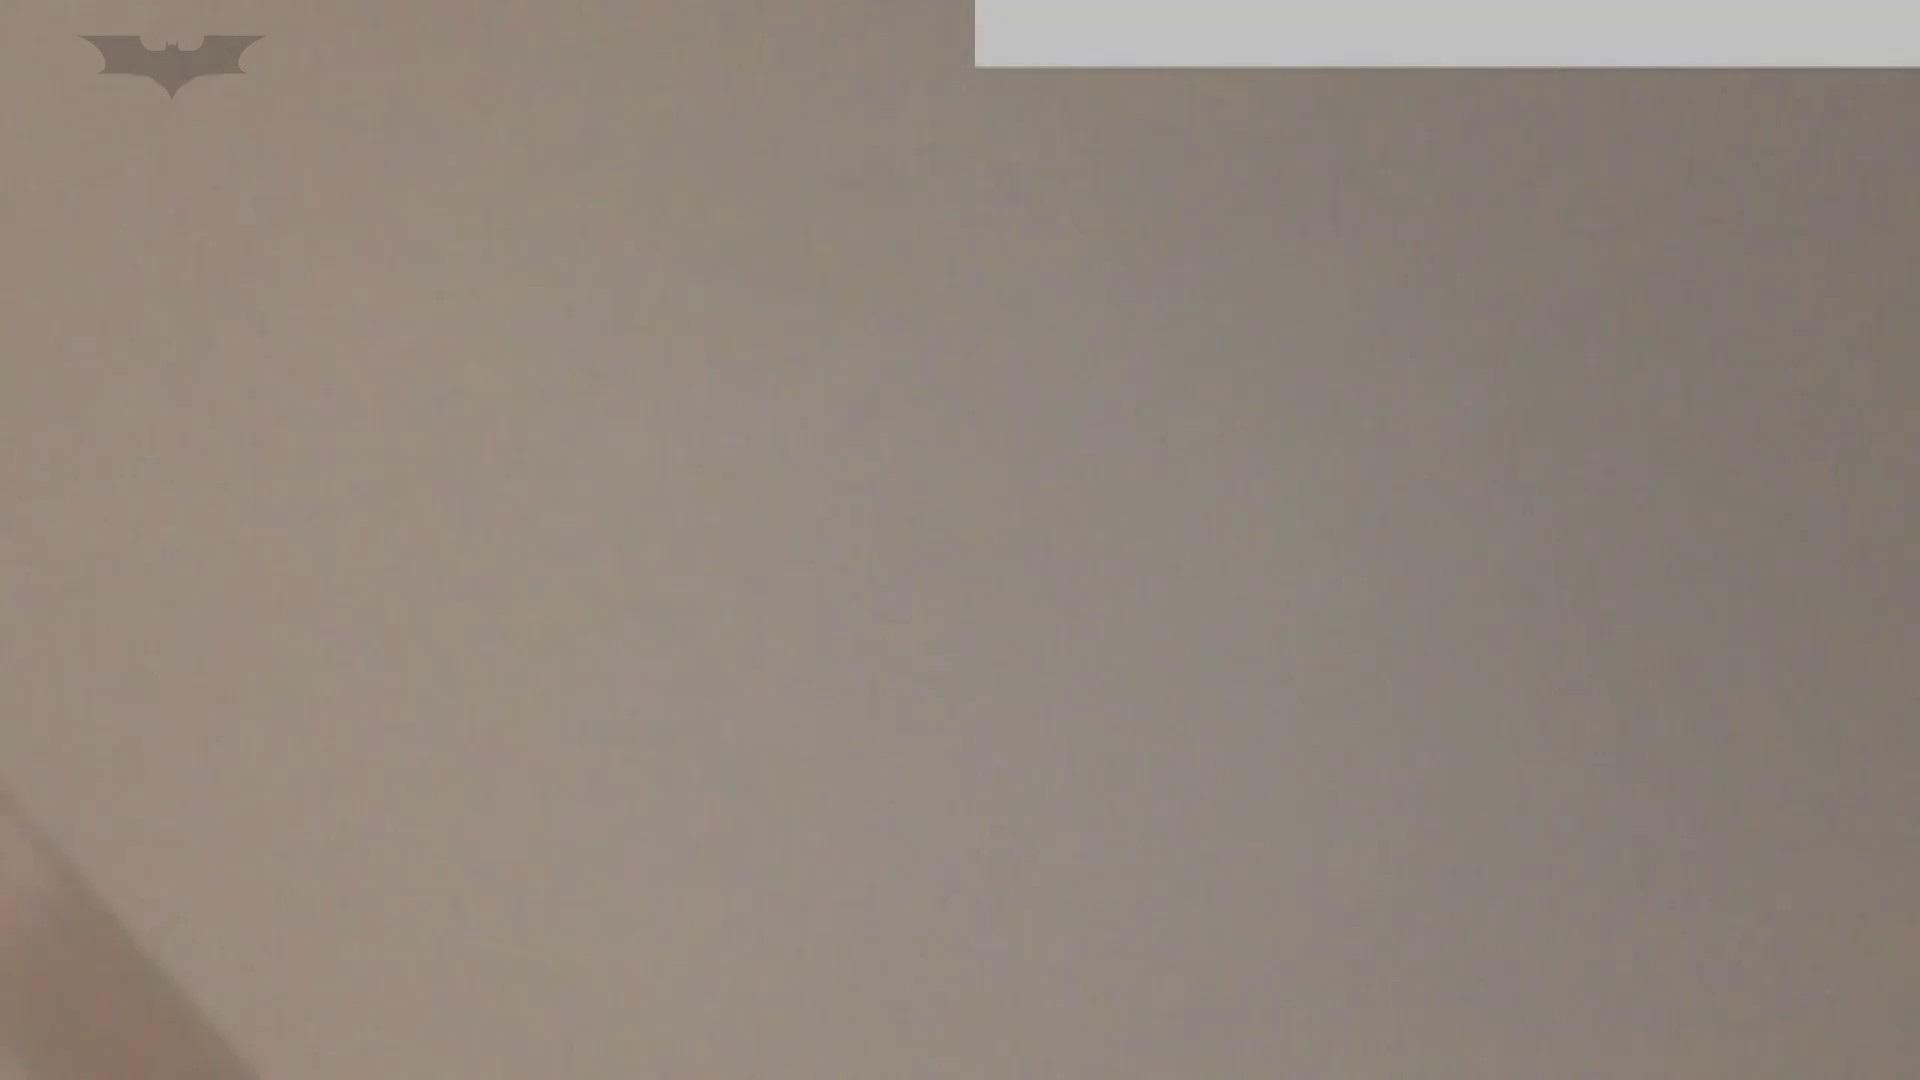 JD盗撮 美女の洗面所の秘密 Vol.14 エッチな盗撮 スケベ動画紹介 100pic 21